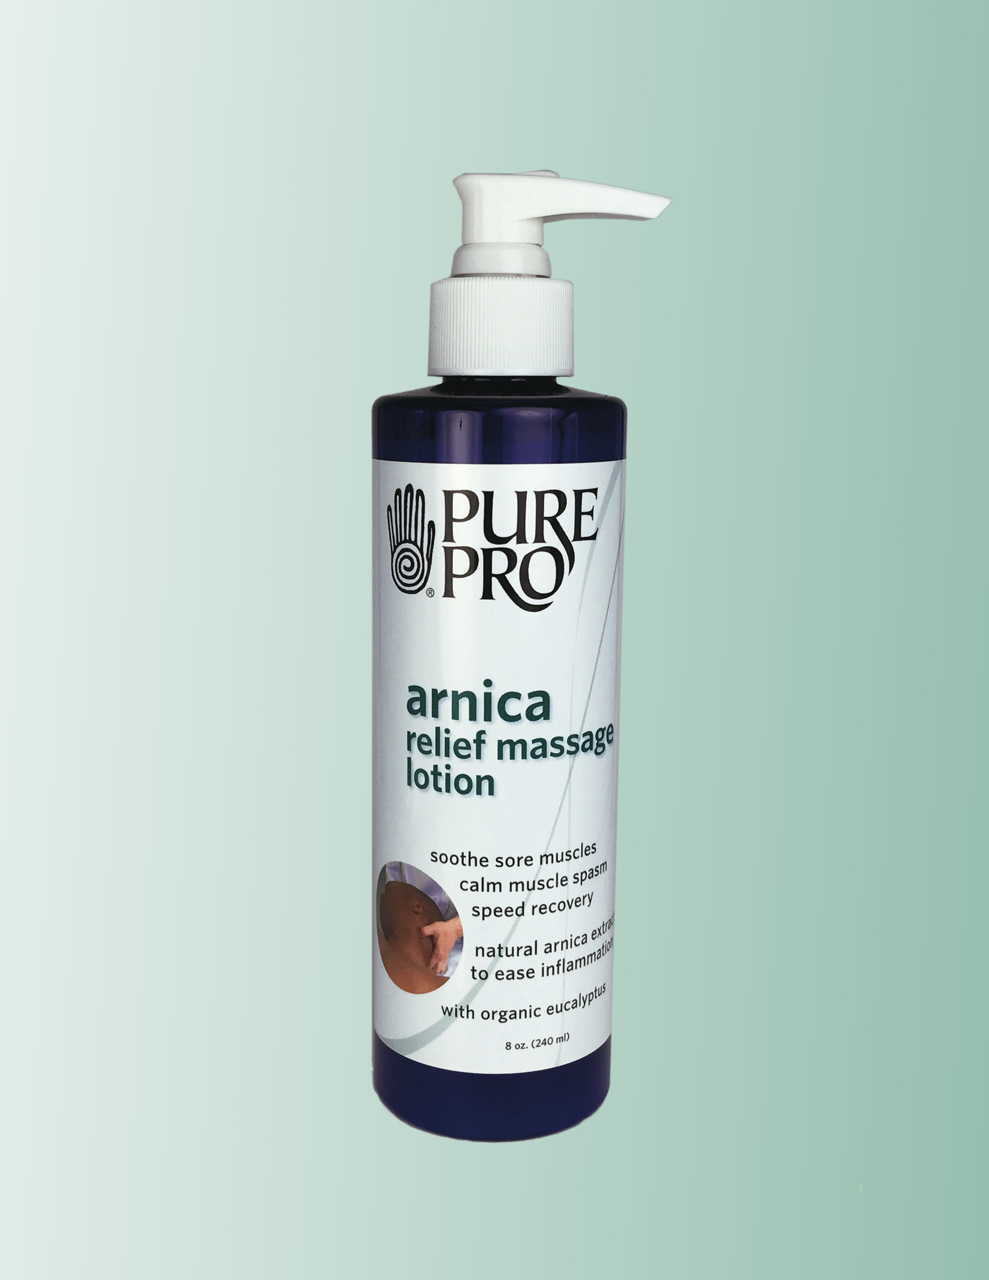 Arnica Relief Massage Lotion, 8 oz, Refillable Bottle w/Pump